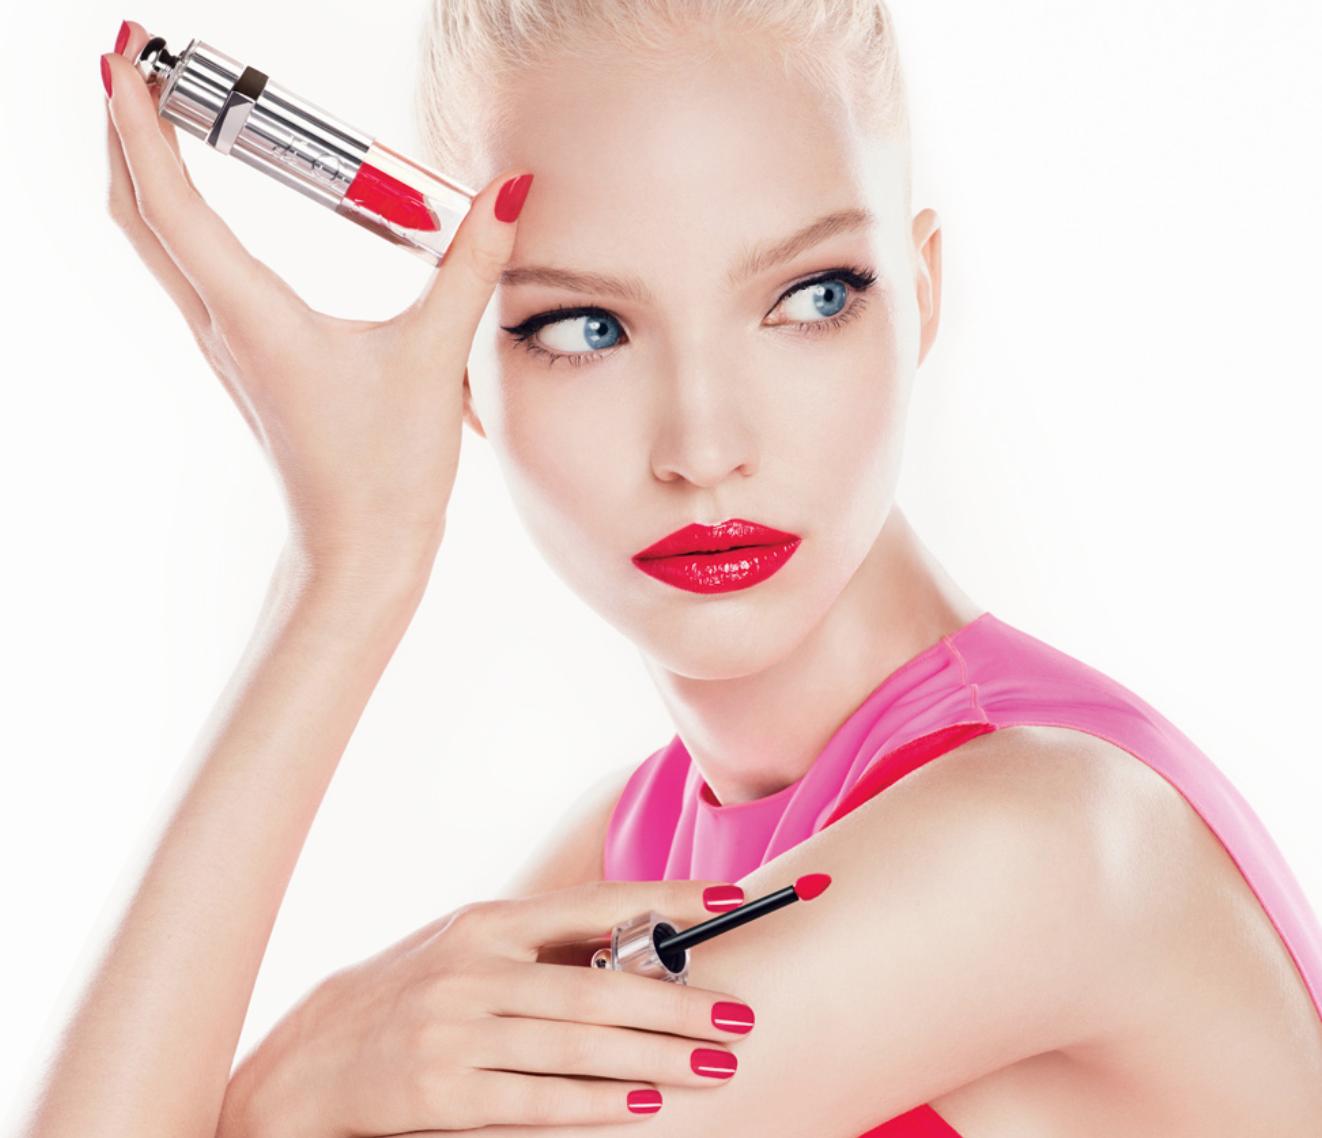 Sasha Luss by Steven Meisel for Dior Addict Beauty S/S 2014